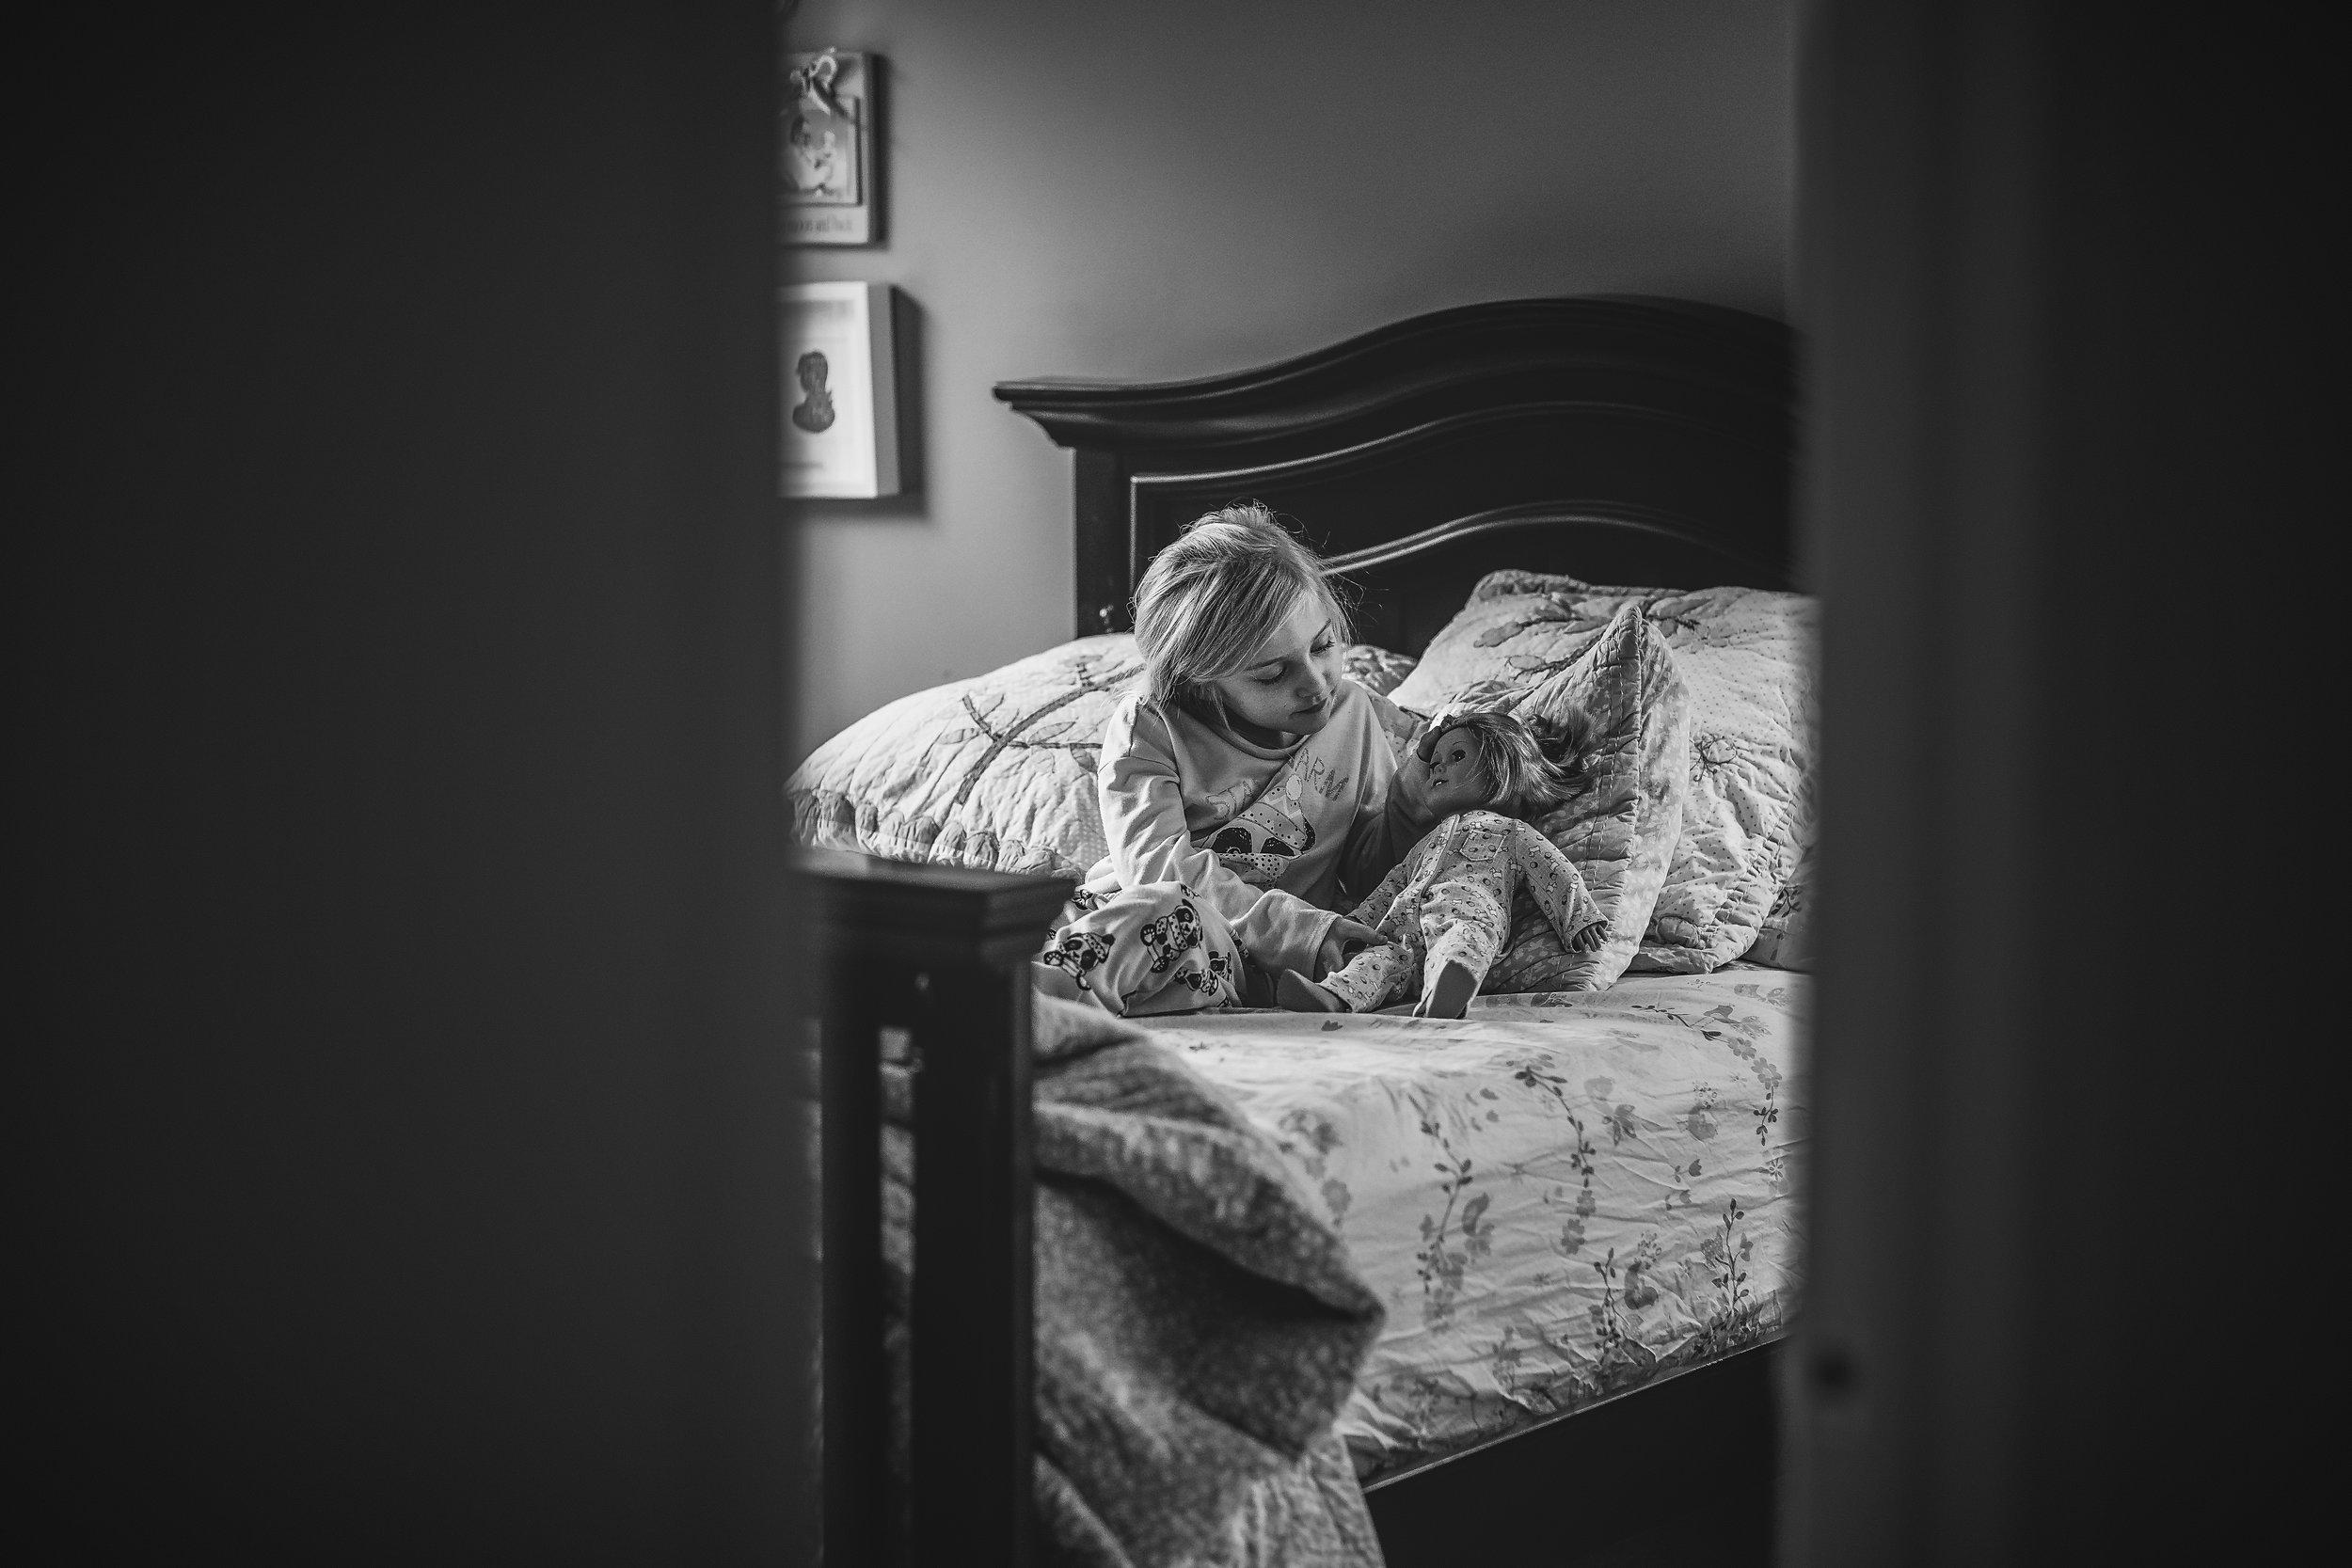 hello-olivia-photography-long-island-photographer-lifestyle-suffolk-girl-bed-pajamas-american-girl.jpg